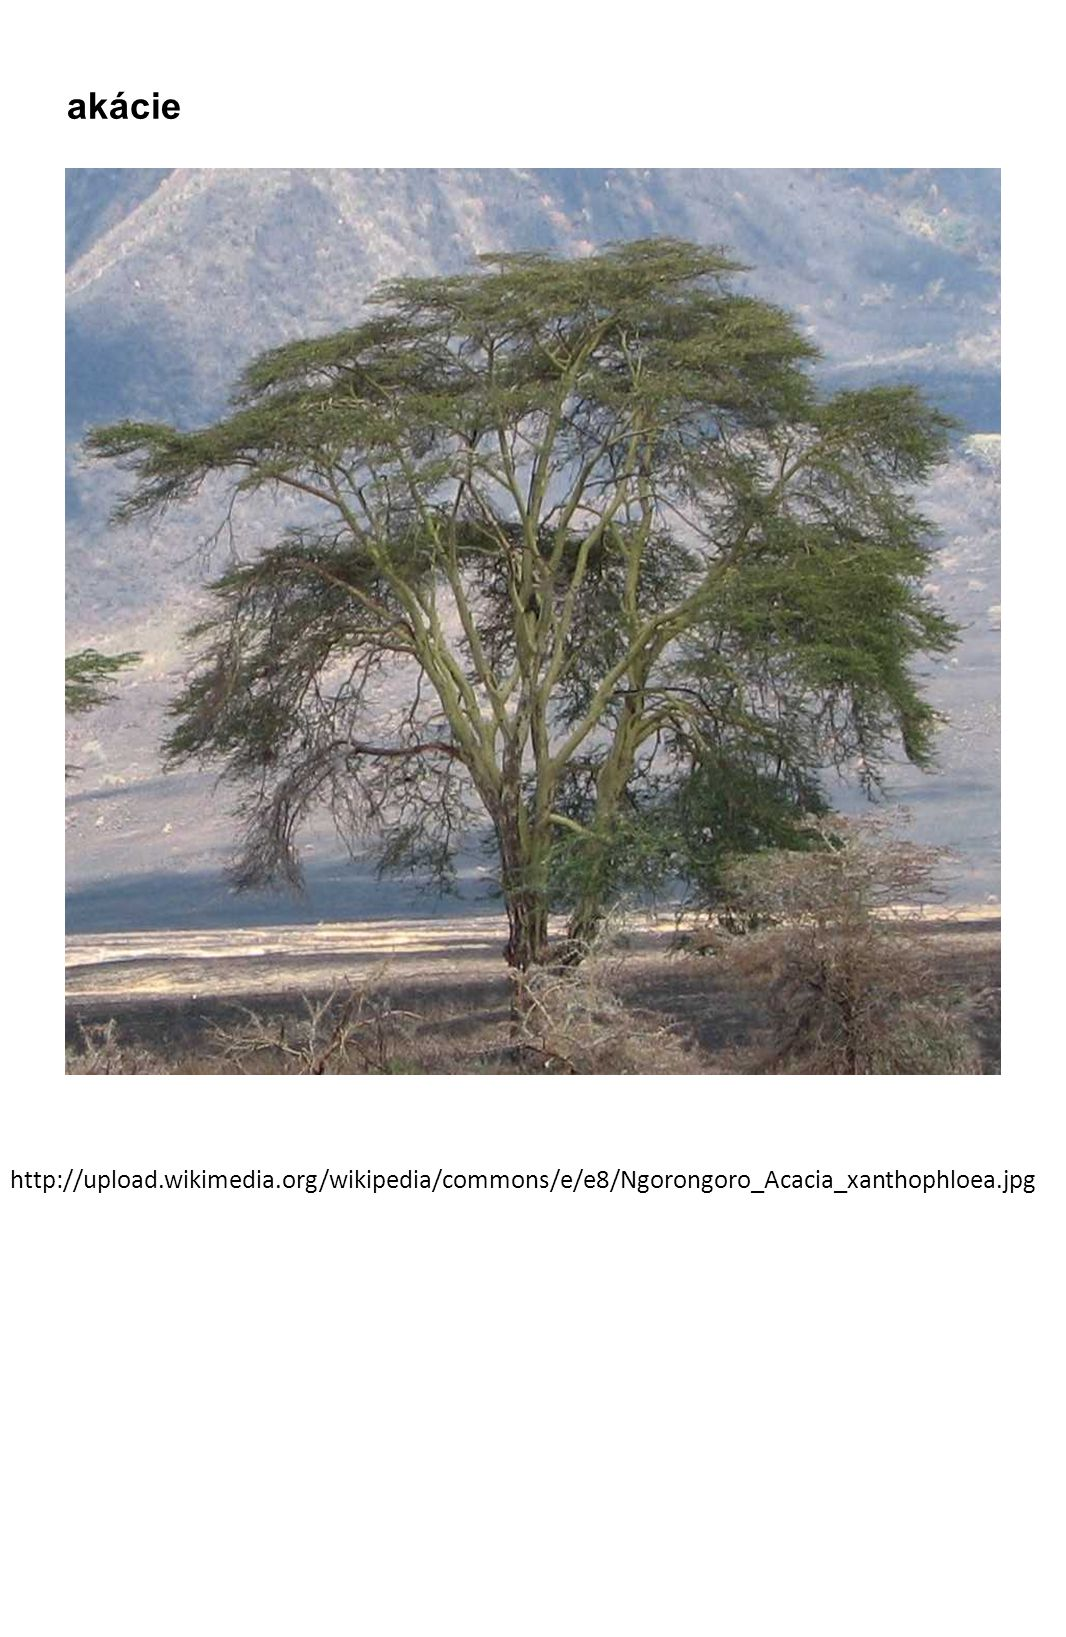 http://upload.wikimedia.org/wikipedia/commons/e/e8/Ngorongoro_Acacia_xanthophloea.jpg akácie